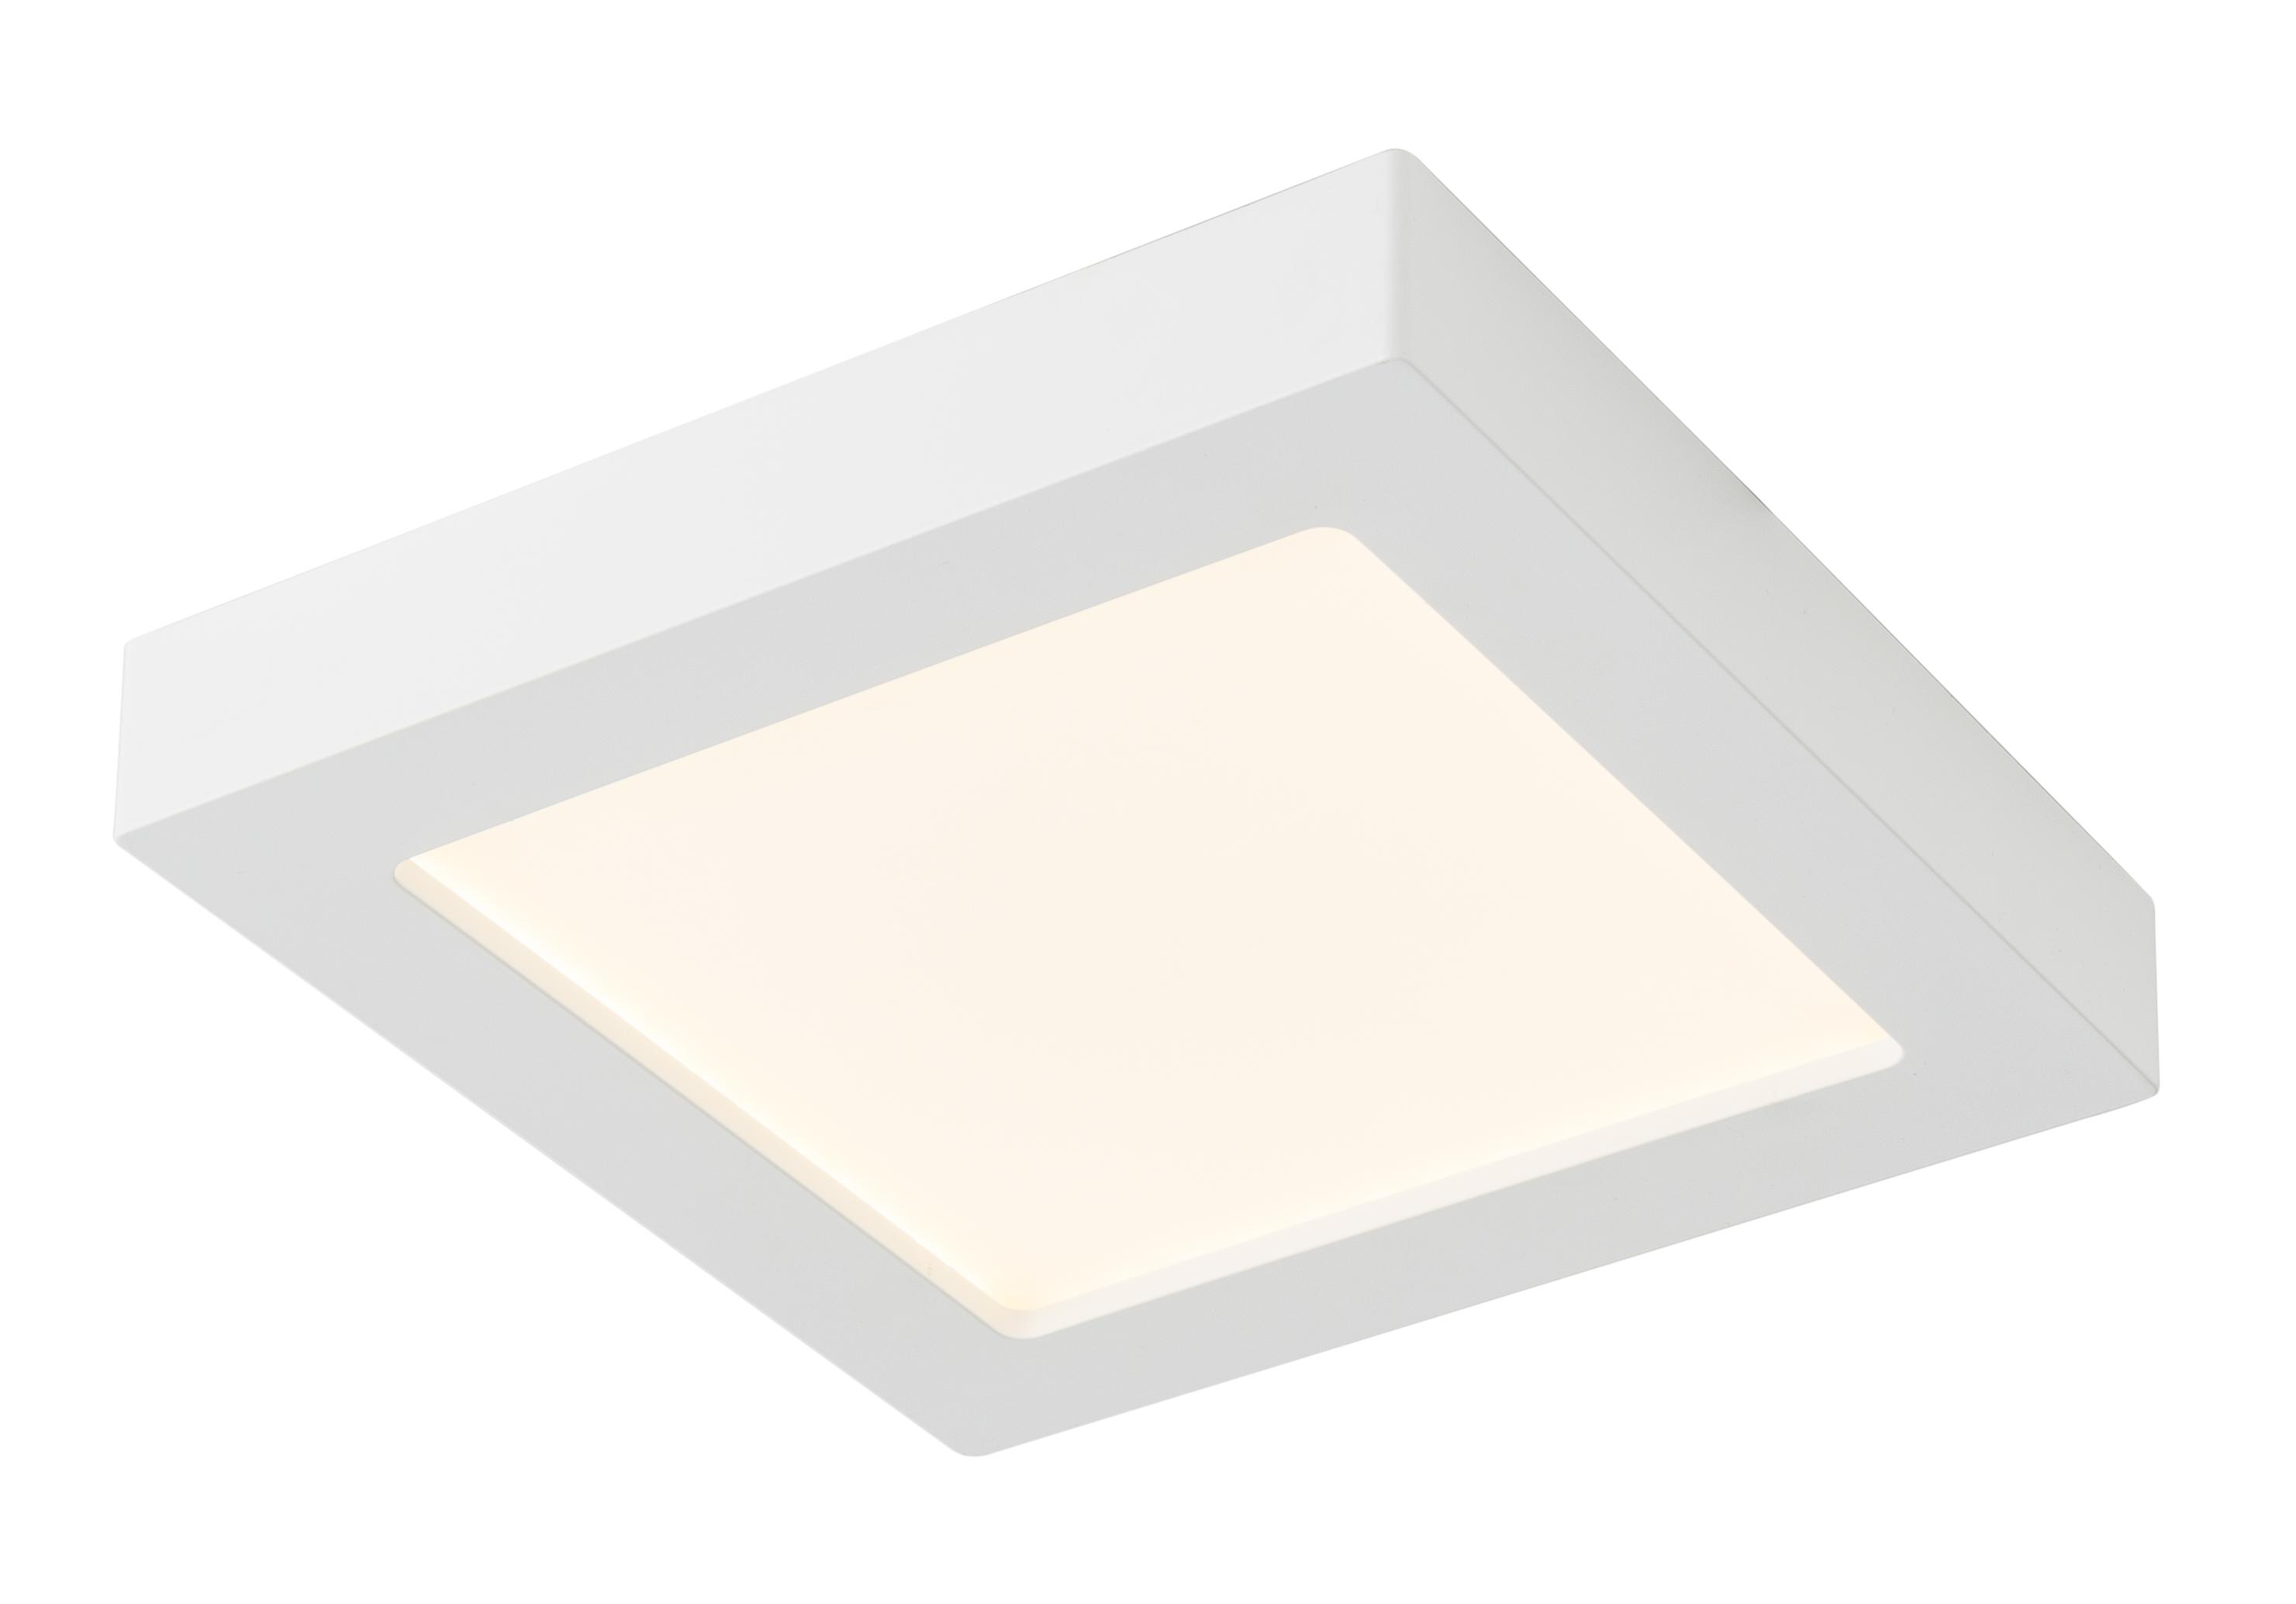 svenja badezimmer r ume produkte globo lighting leuchten lampen online kaufen. Black Bedroom Furniture Sets. Home Design Ideas